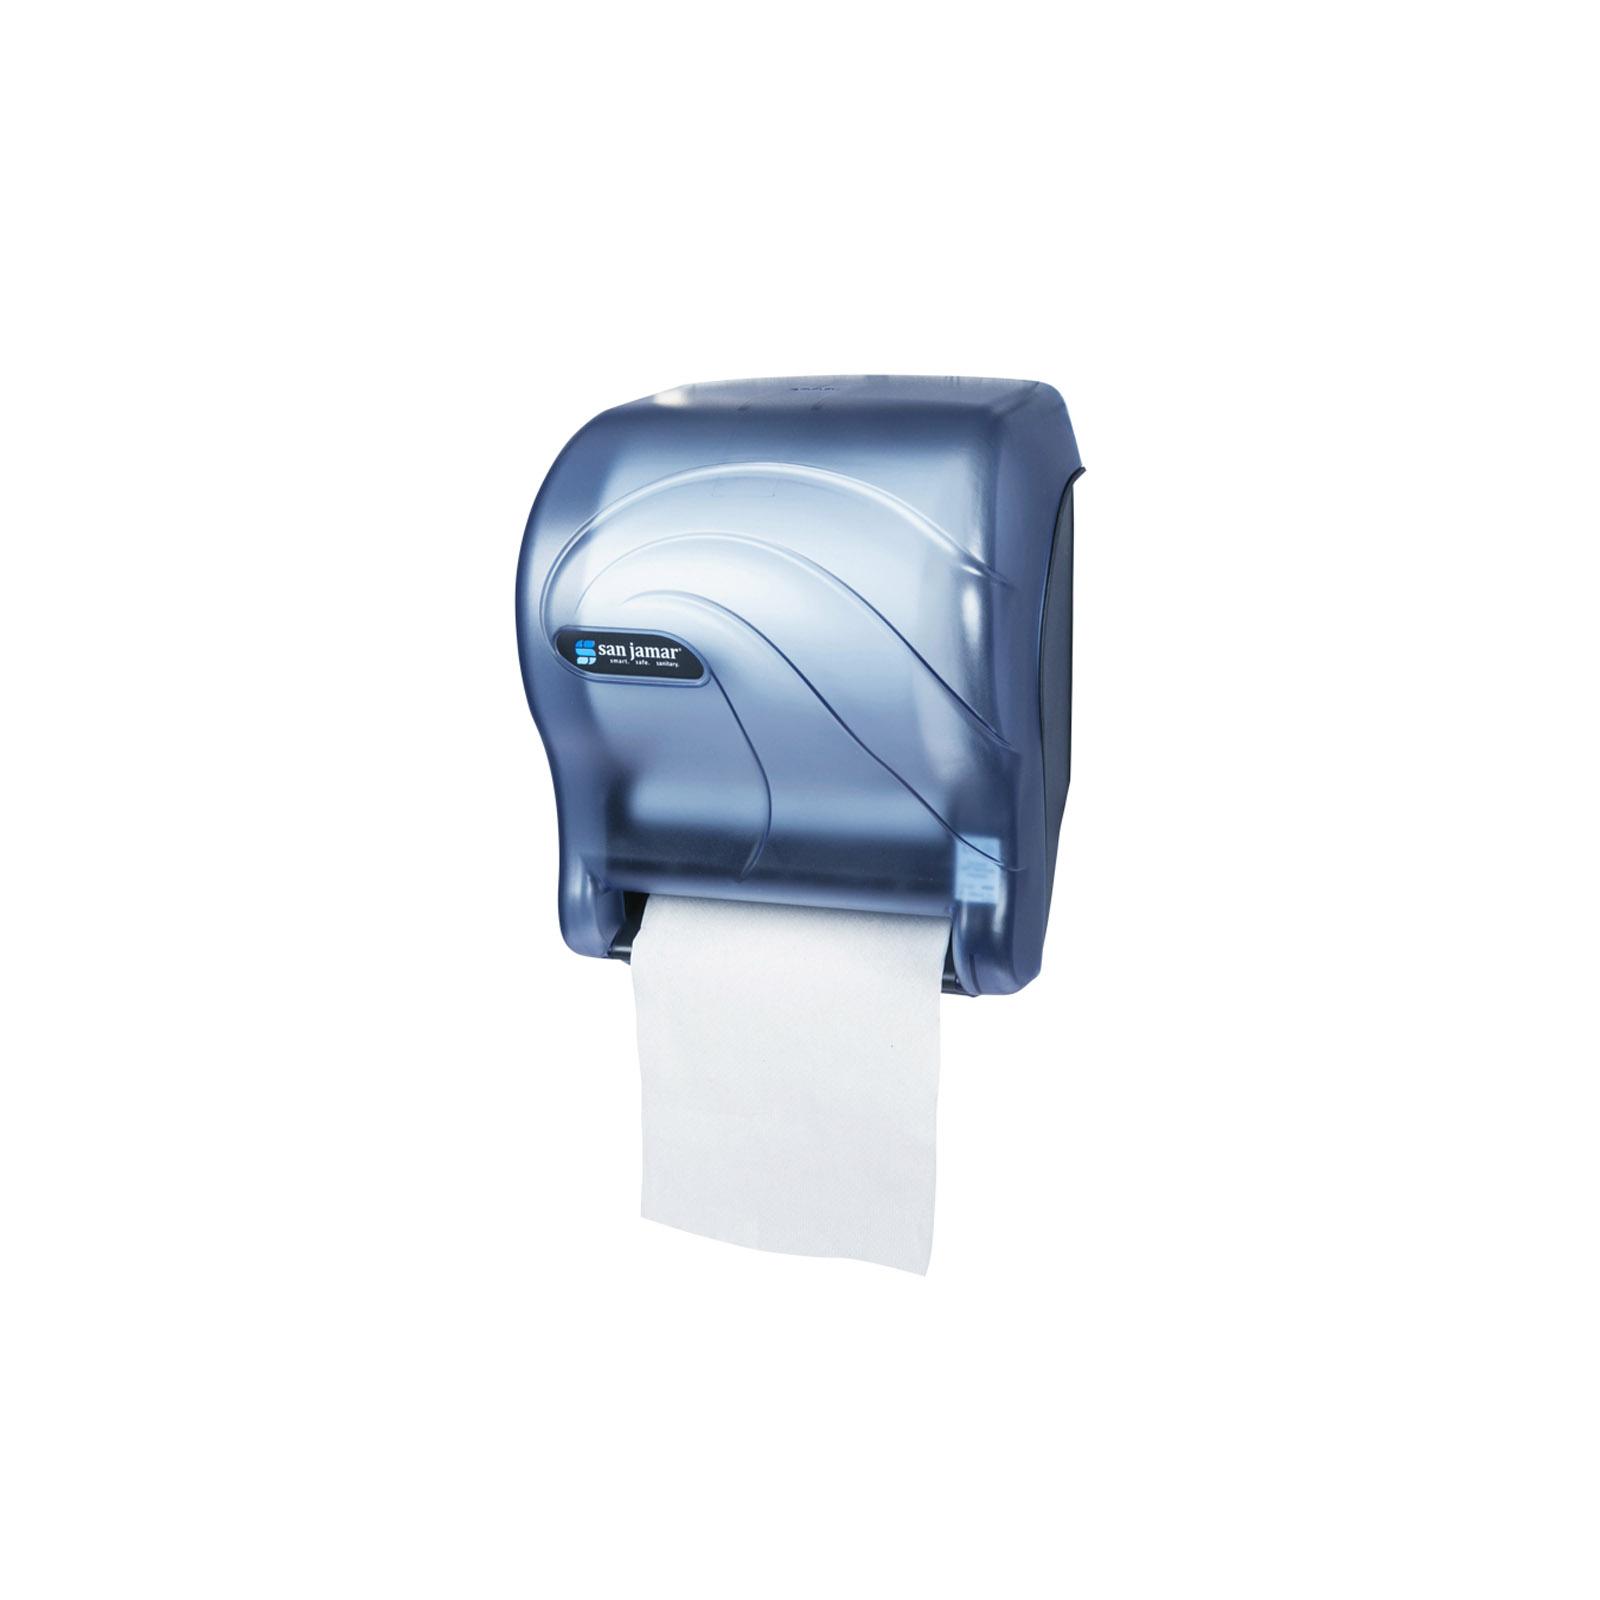 San Jamar T8090TBL paper towel dispenser